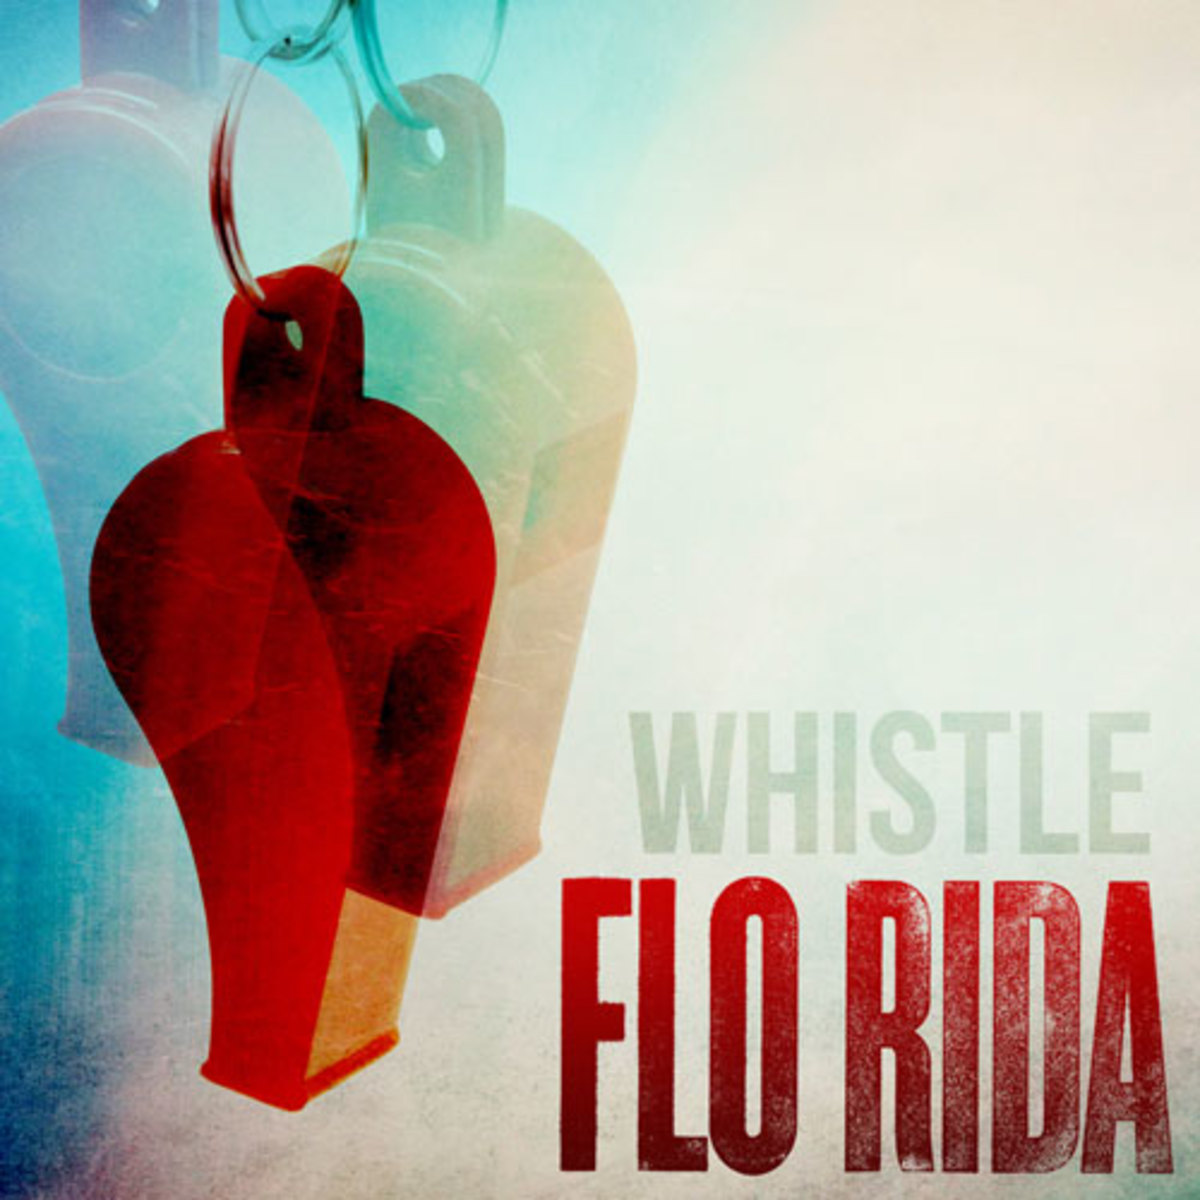 florida-whistle.jpg